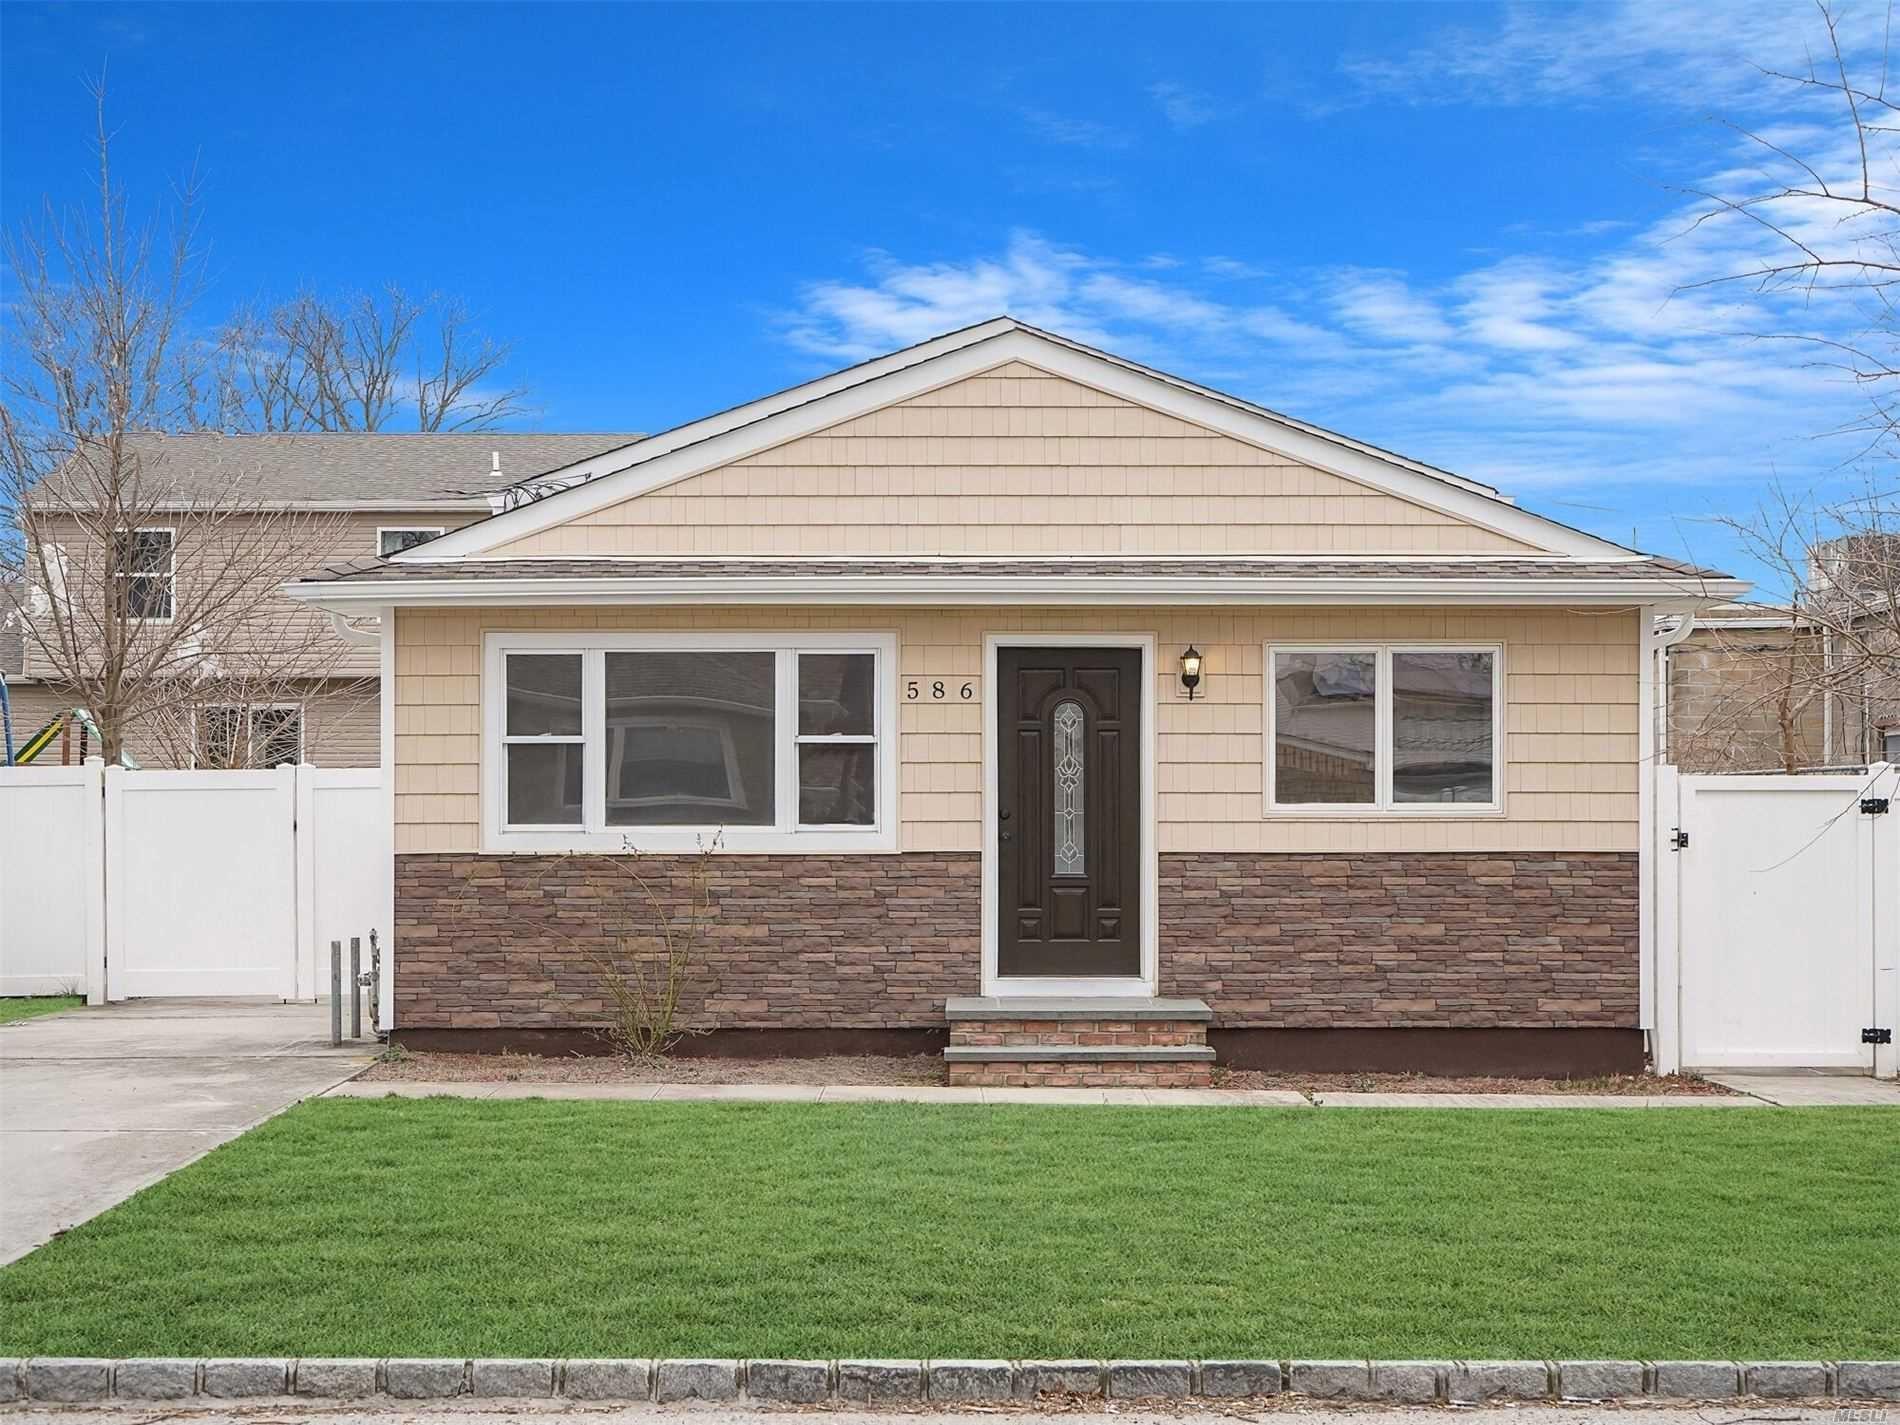 586 S 8th St, Lindenhurst, NY 11757 - MLS#: 3215087